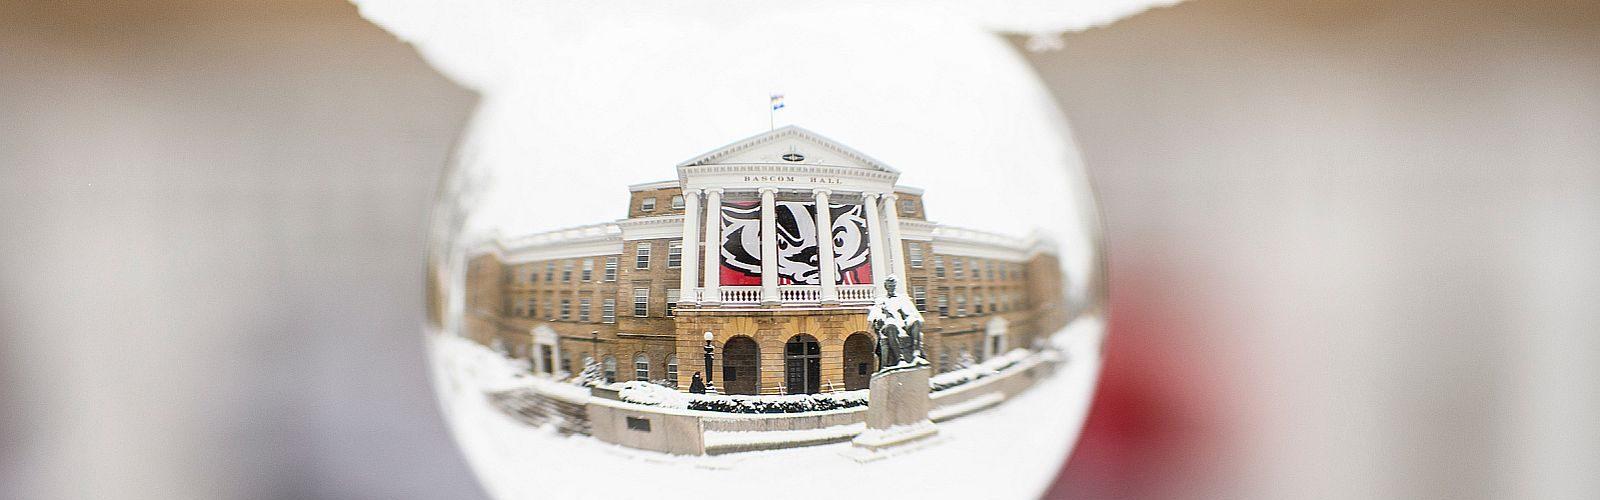 Bascom hall in winter